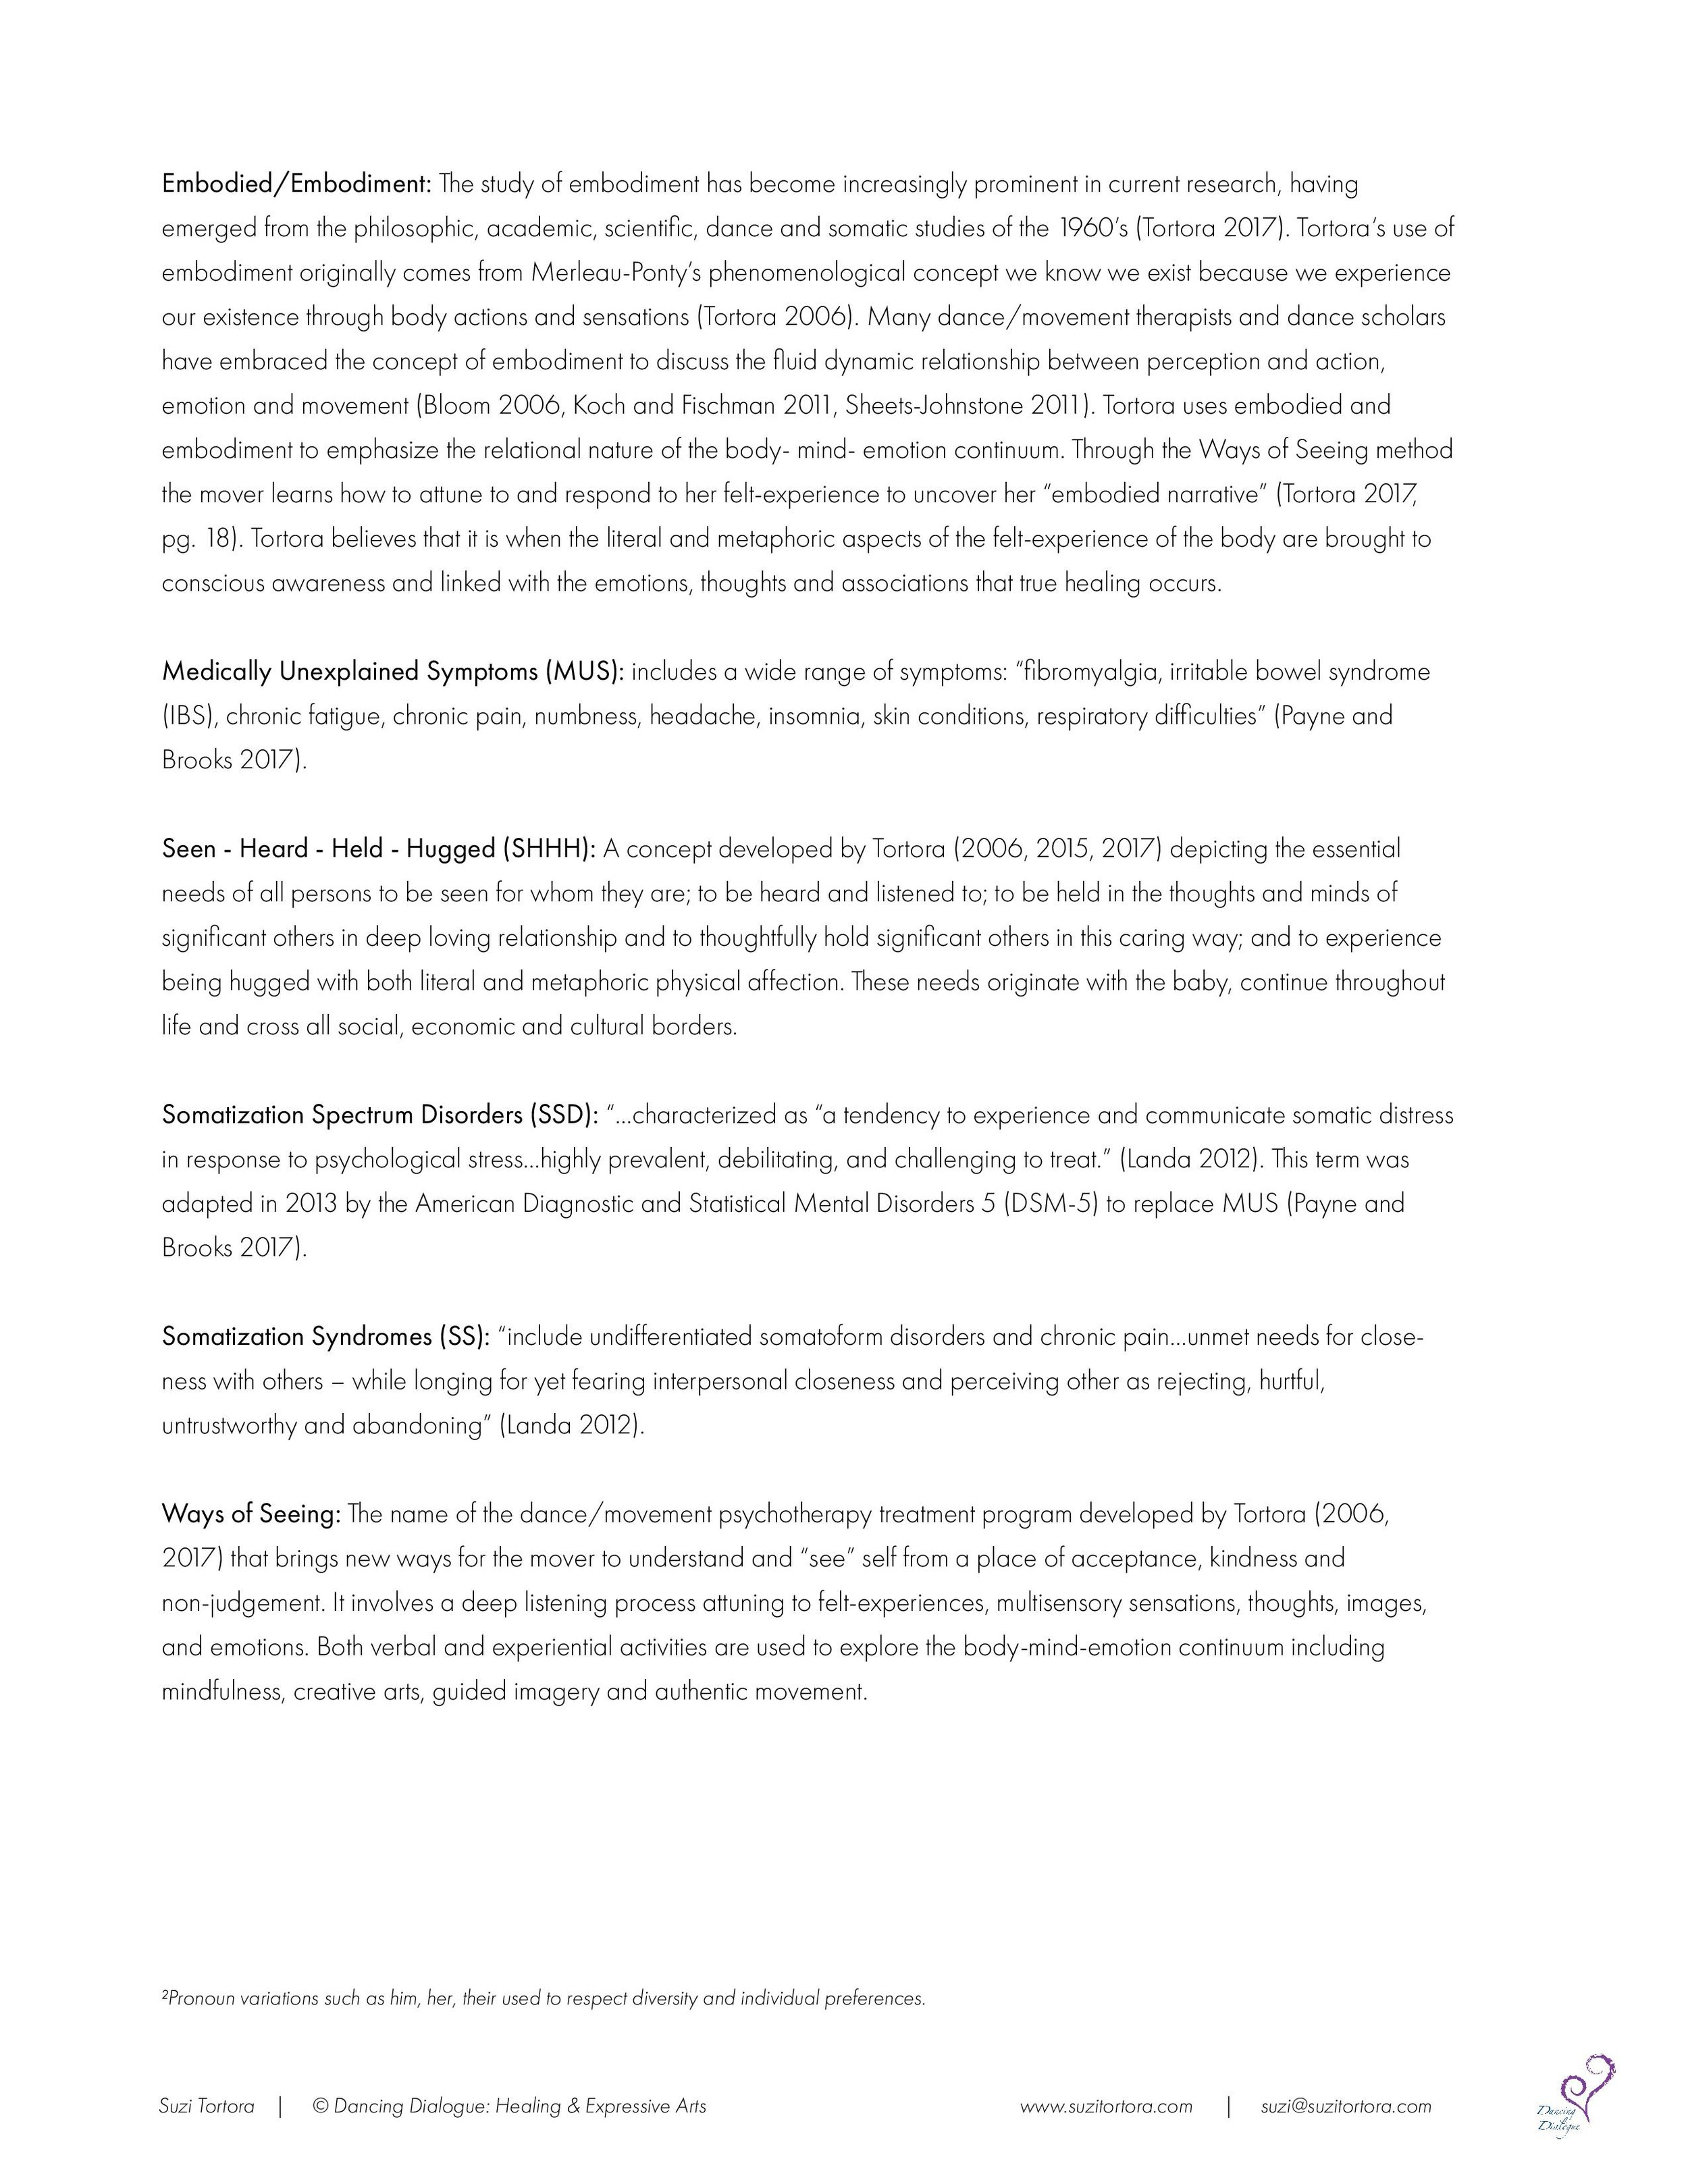 SD_PDFdownload_v3-page-002.jpg